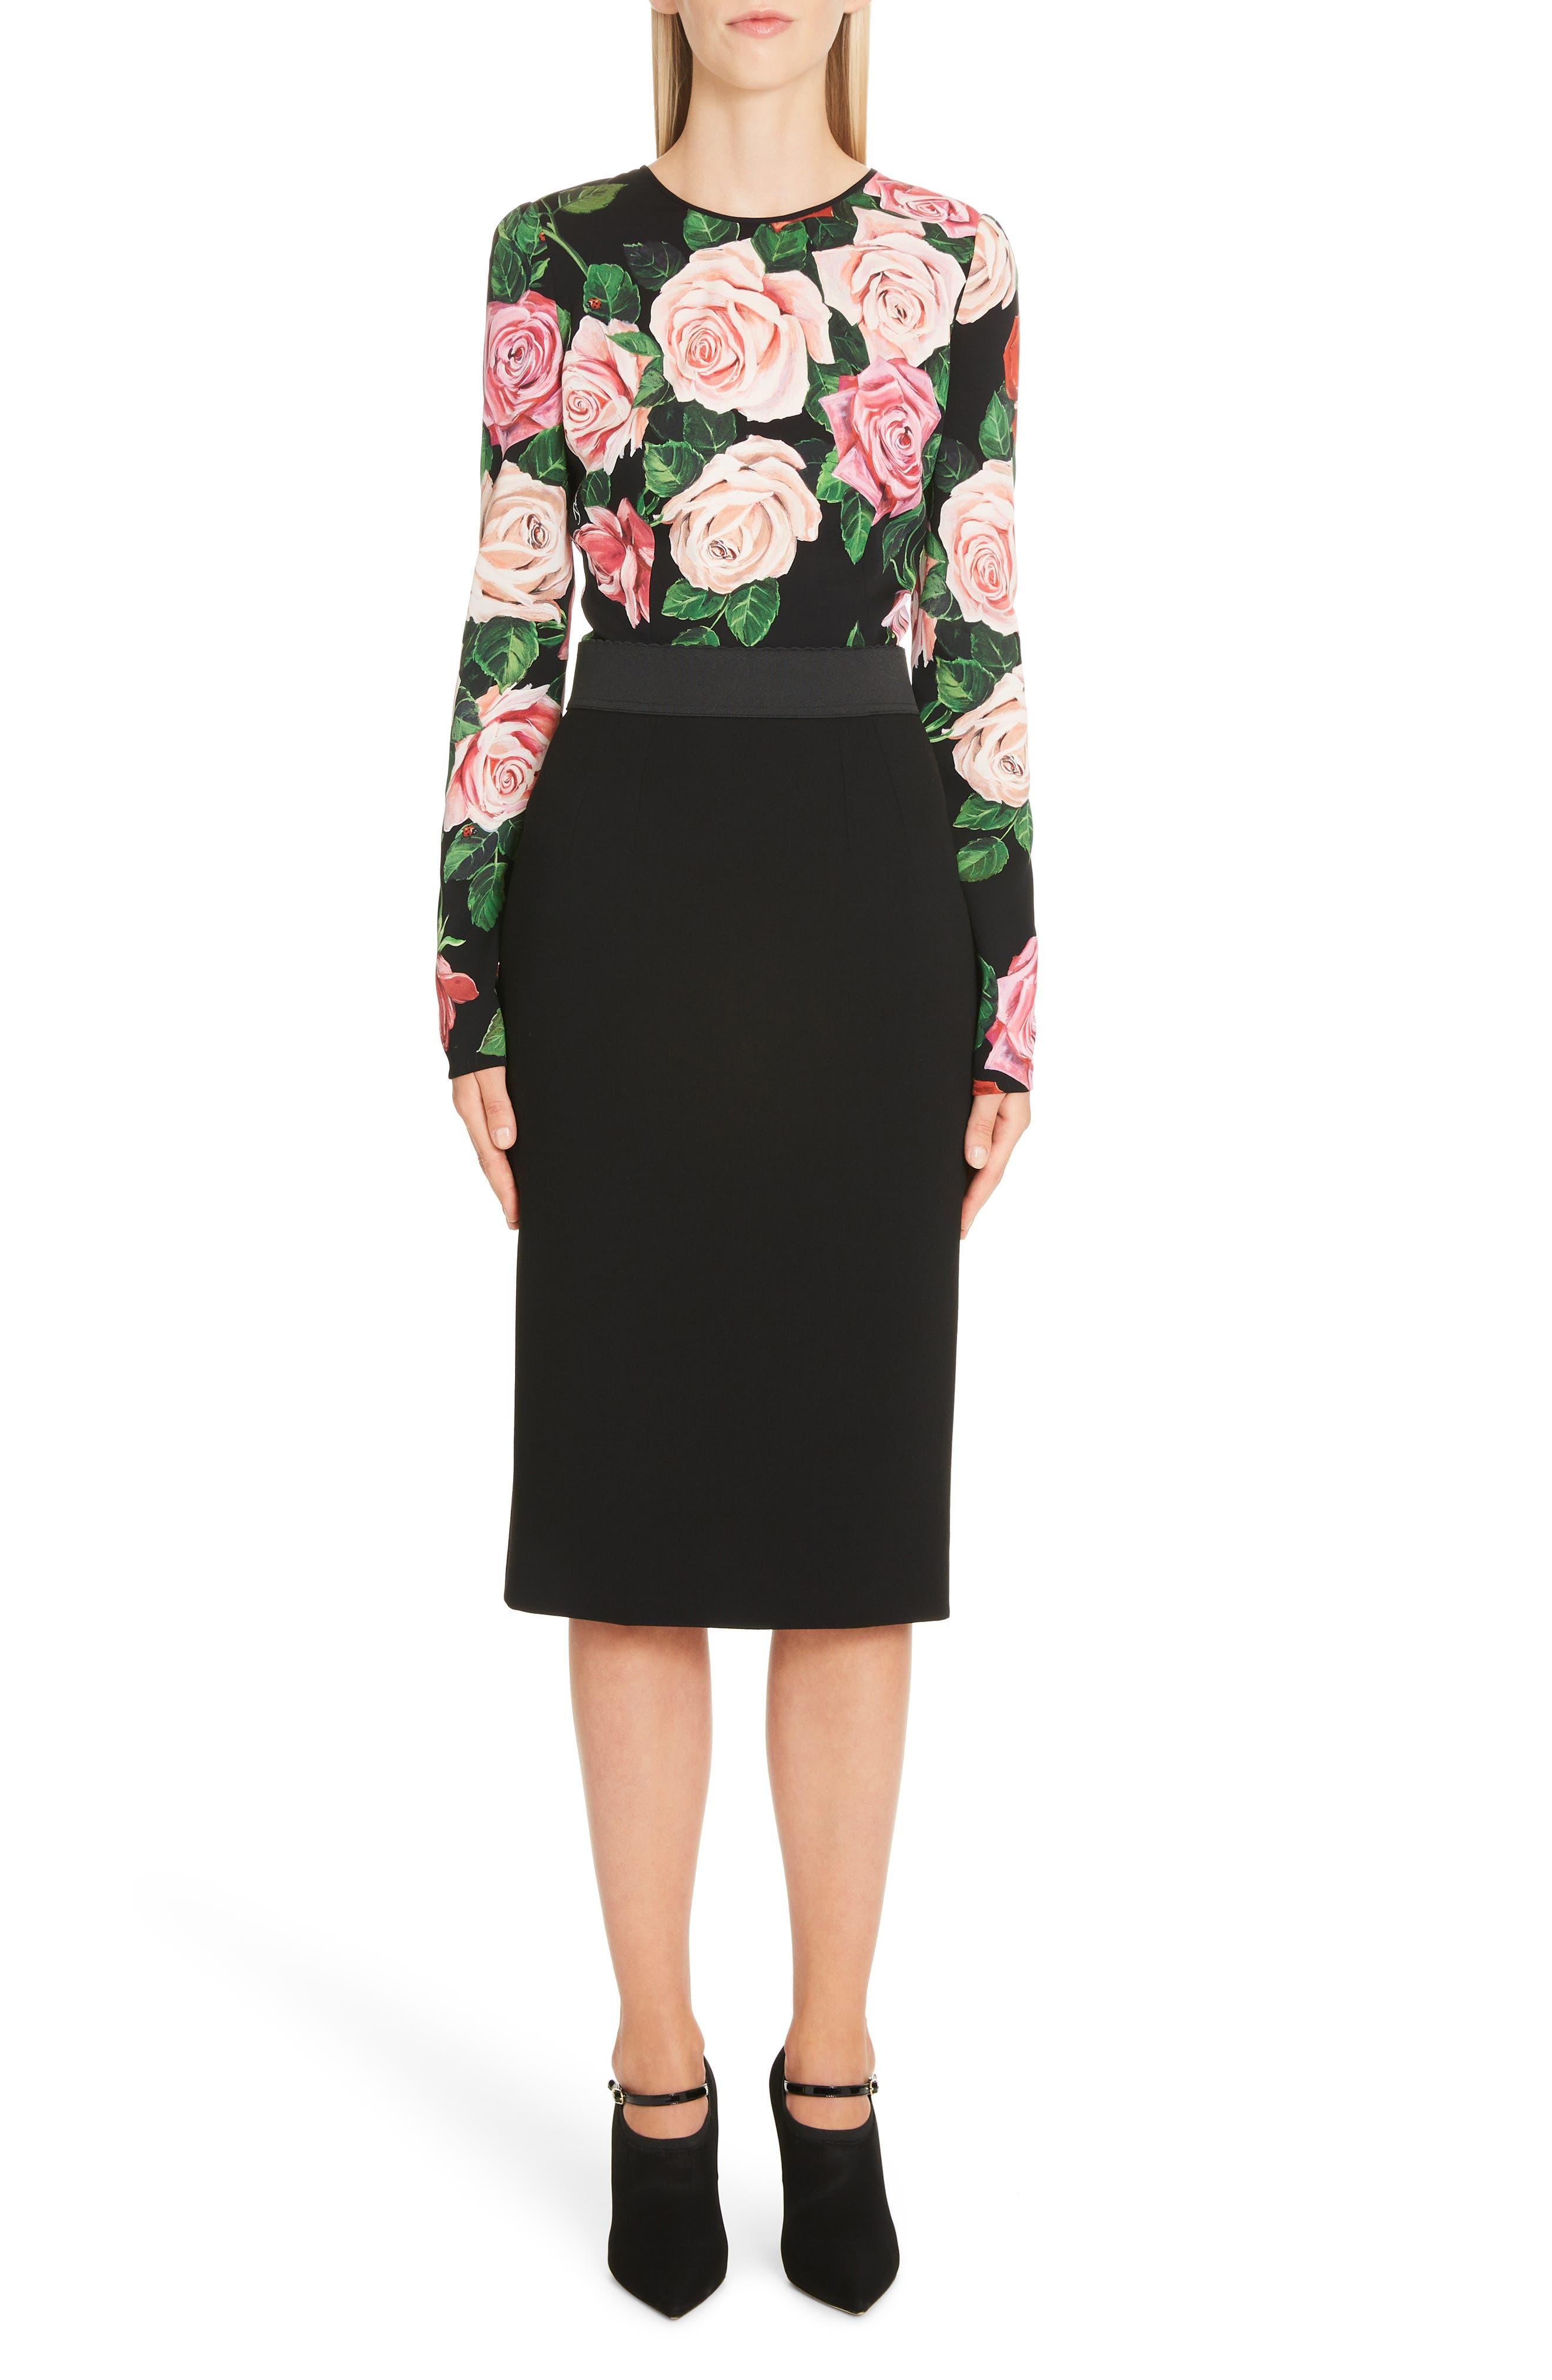 DOLCE&GABBANA, Rose Print Stretch Silk Top, Alternate thumbnail 7, color, BLACK ROSE